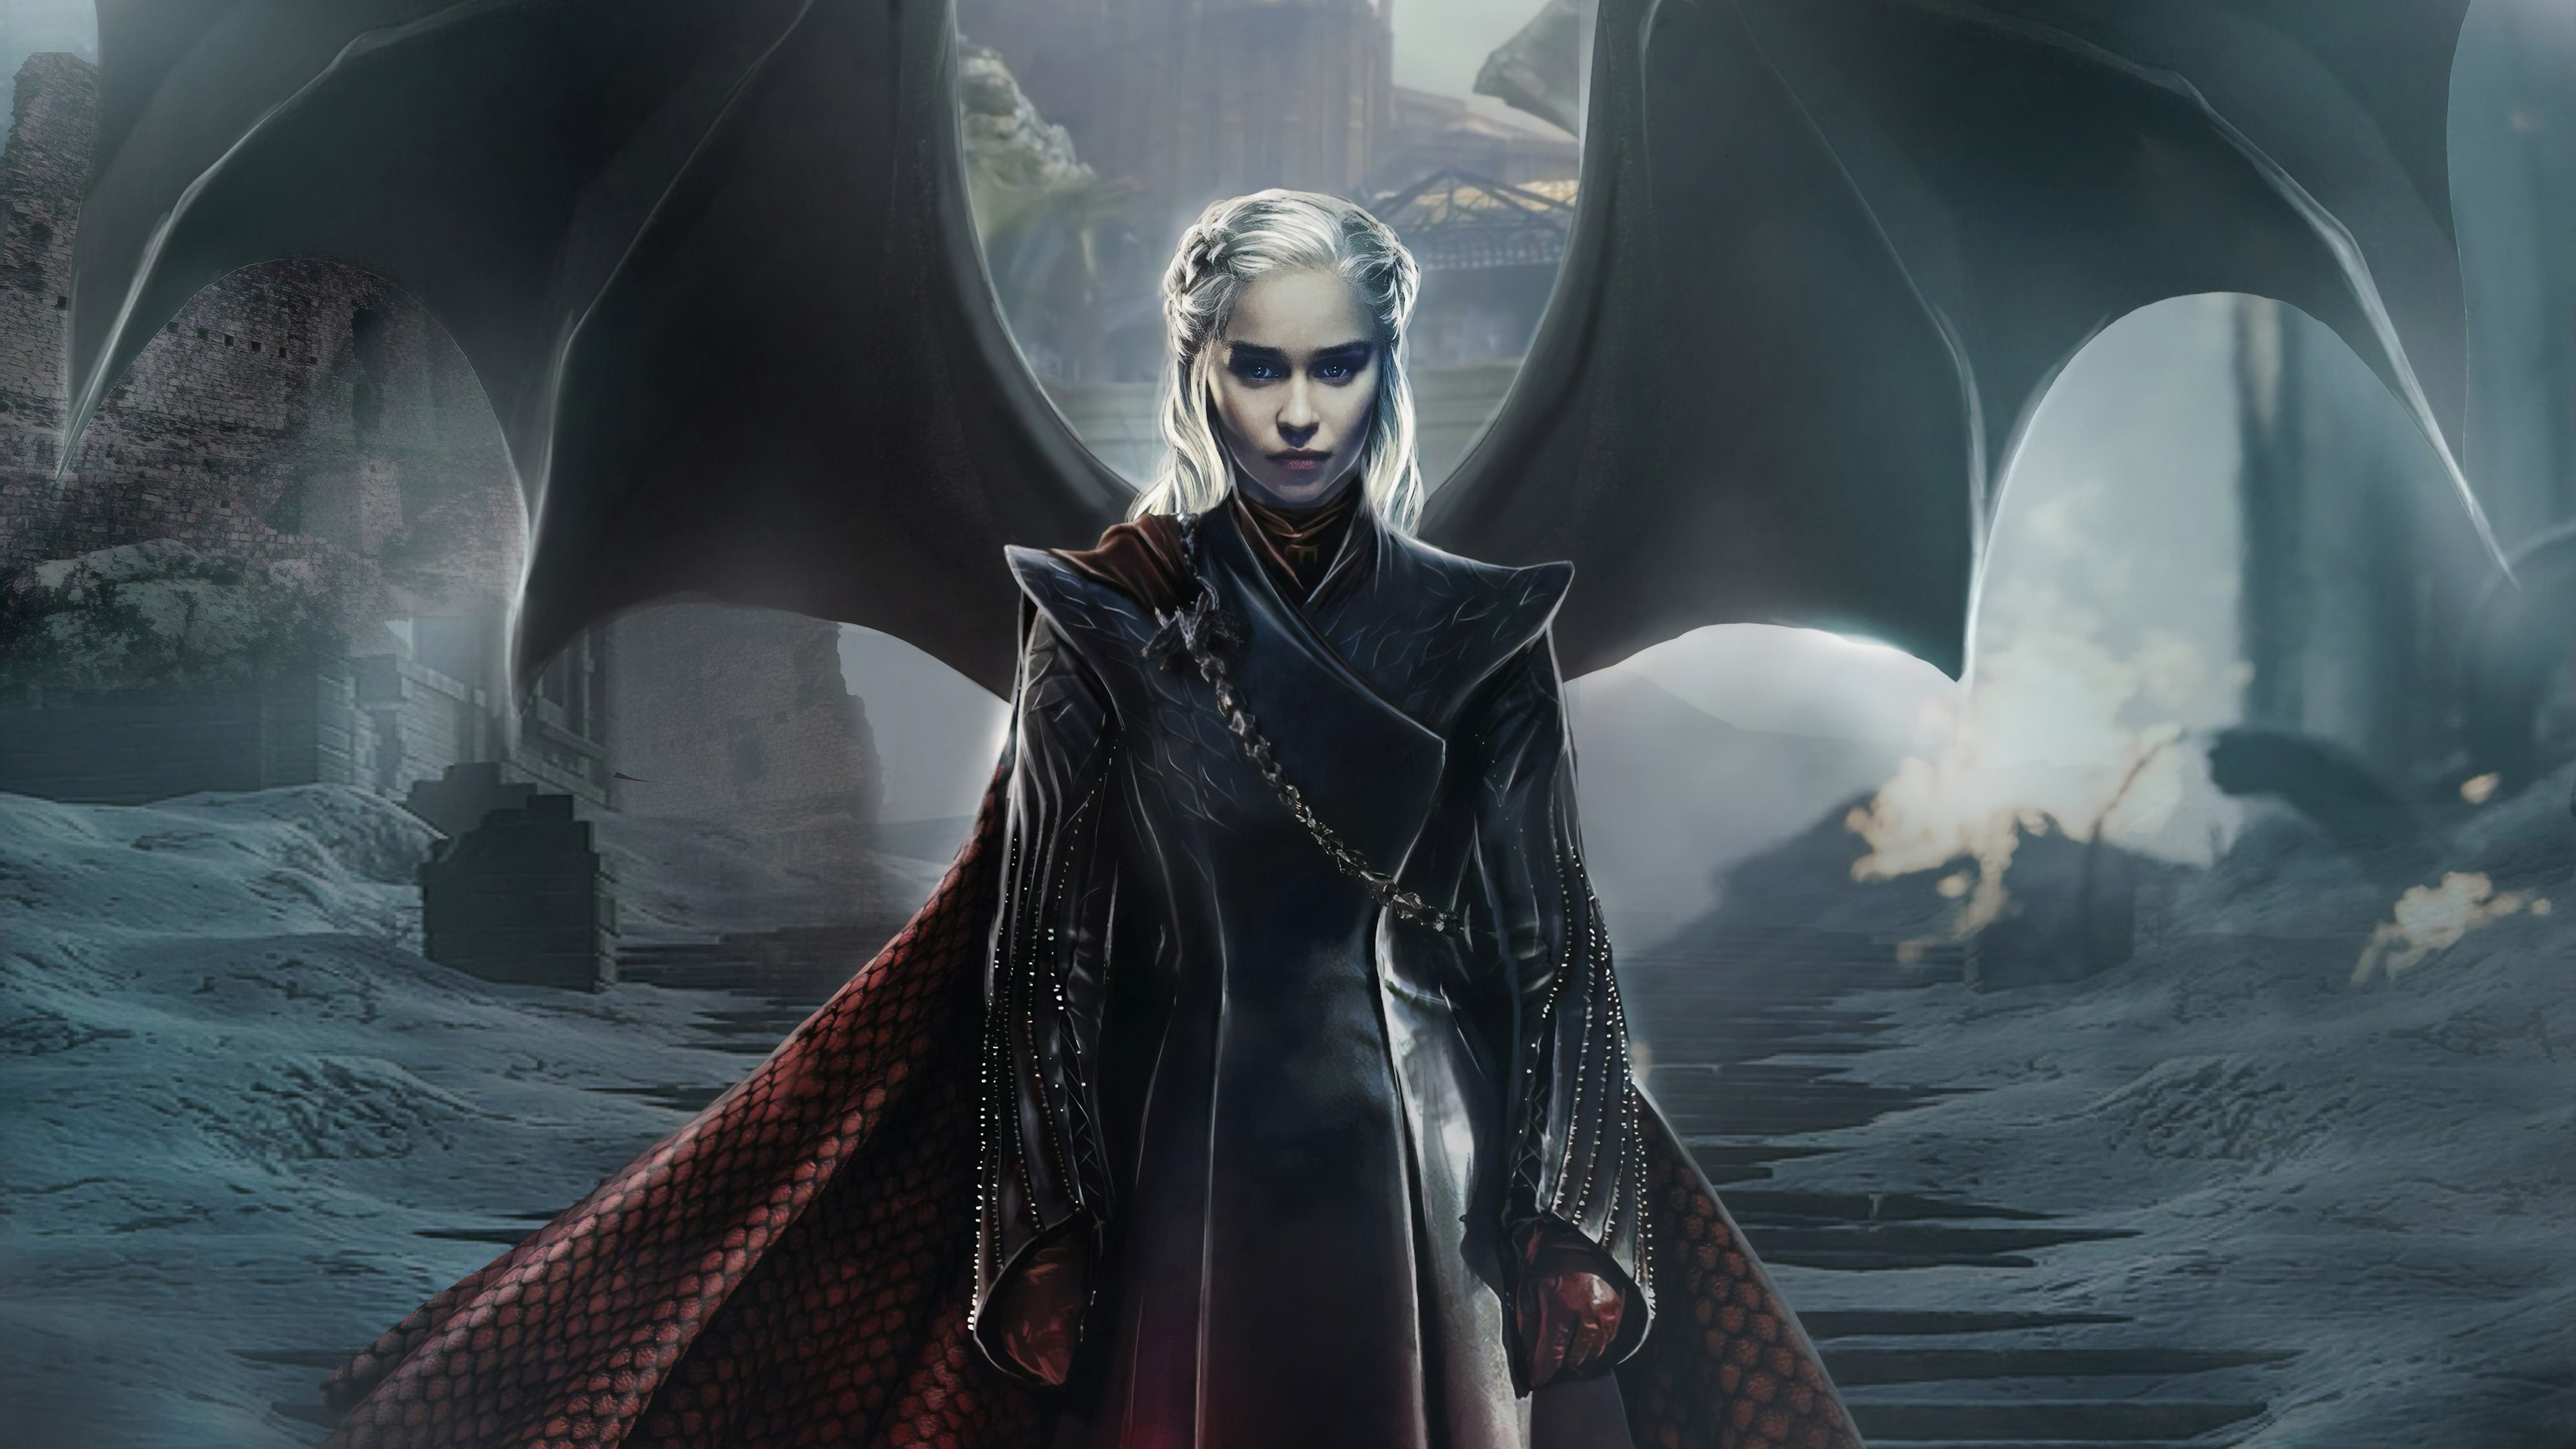 Daenerys targaryen game of thrones season 8 Wallpaper Poster 24 x 14 inches